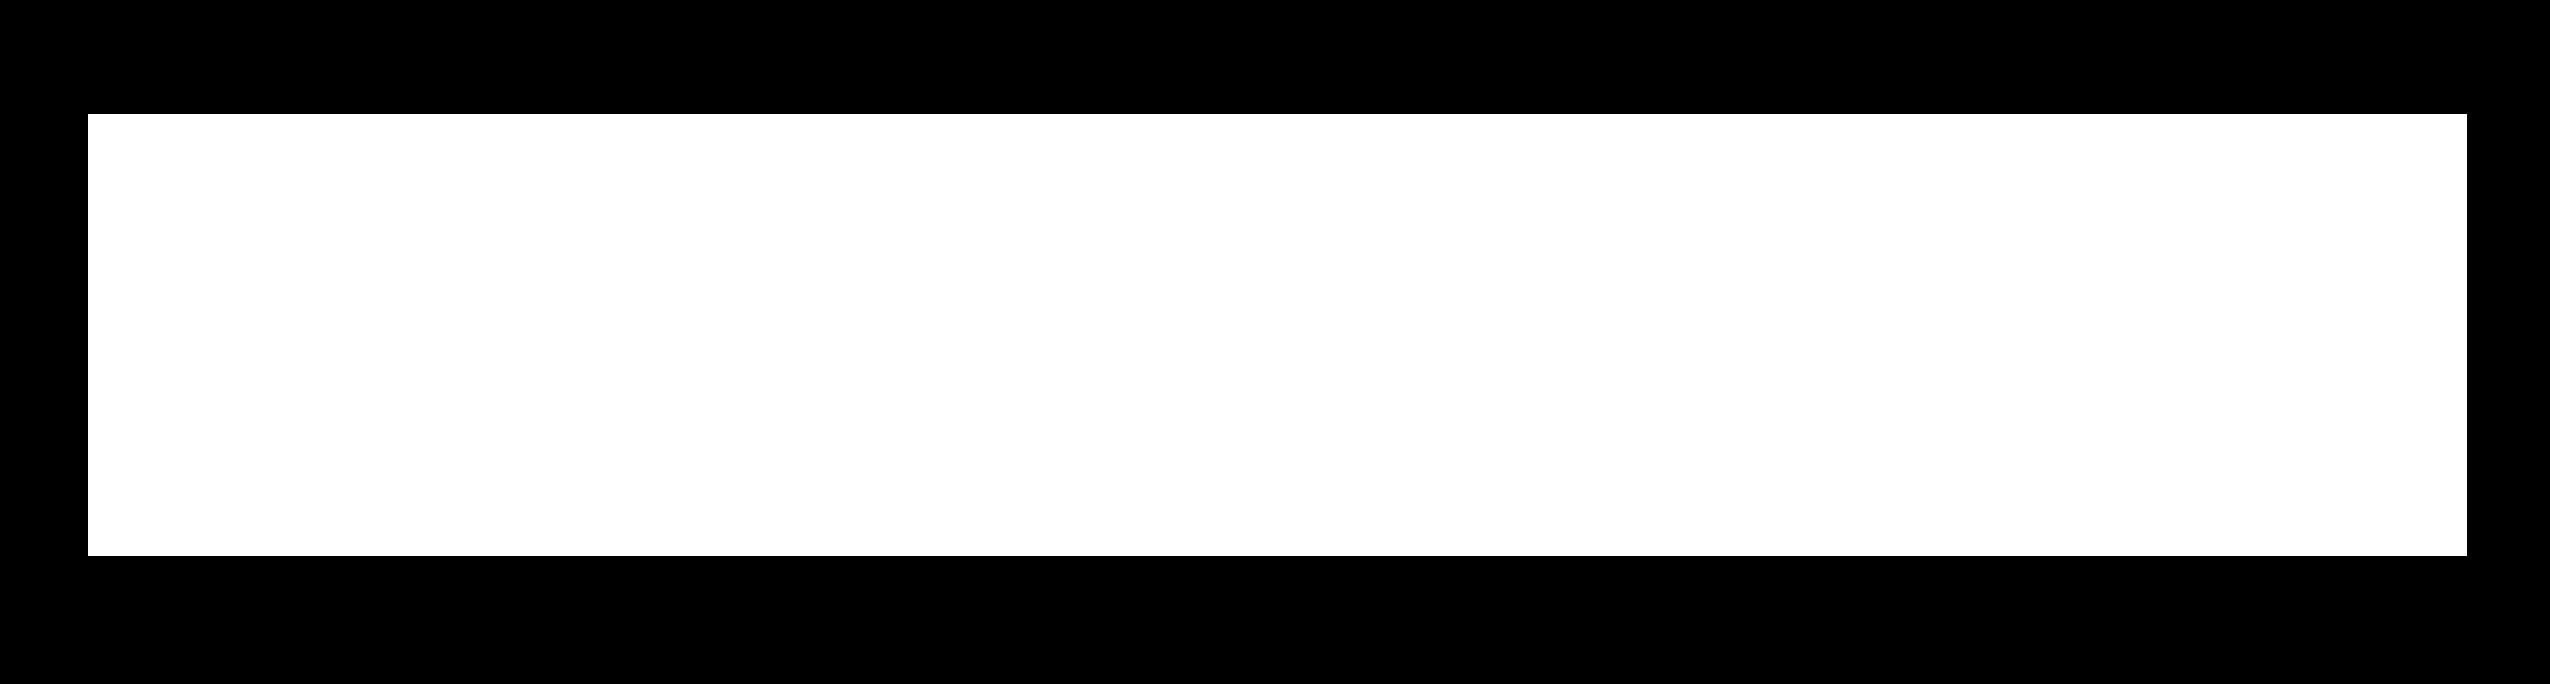 Roku TV logo